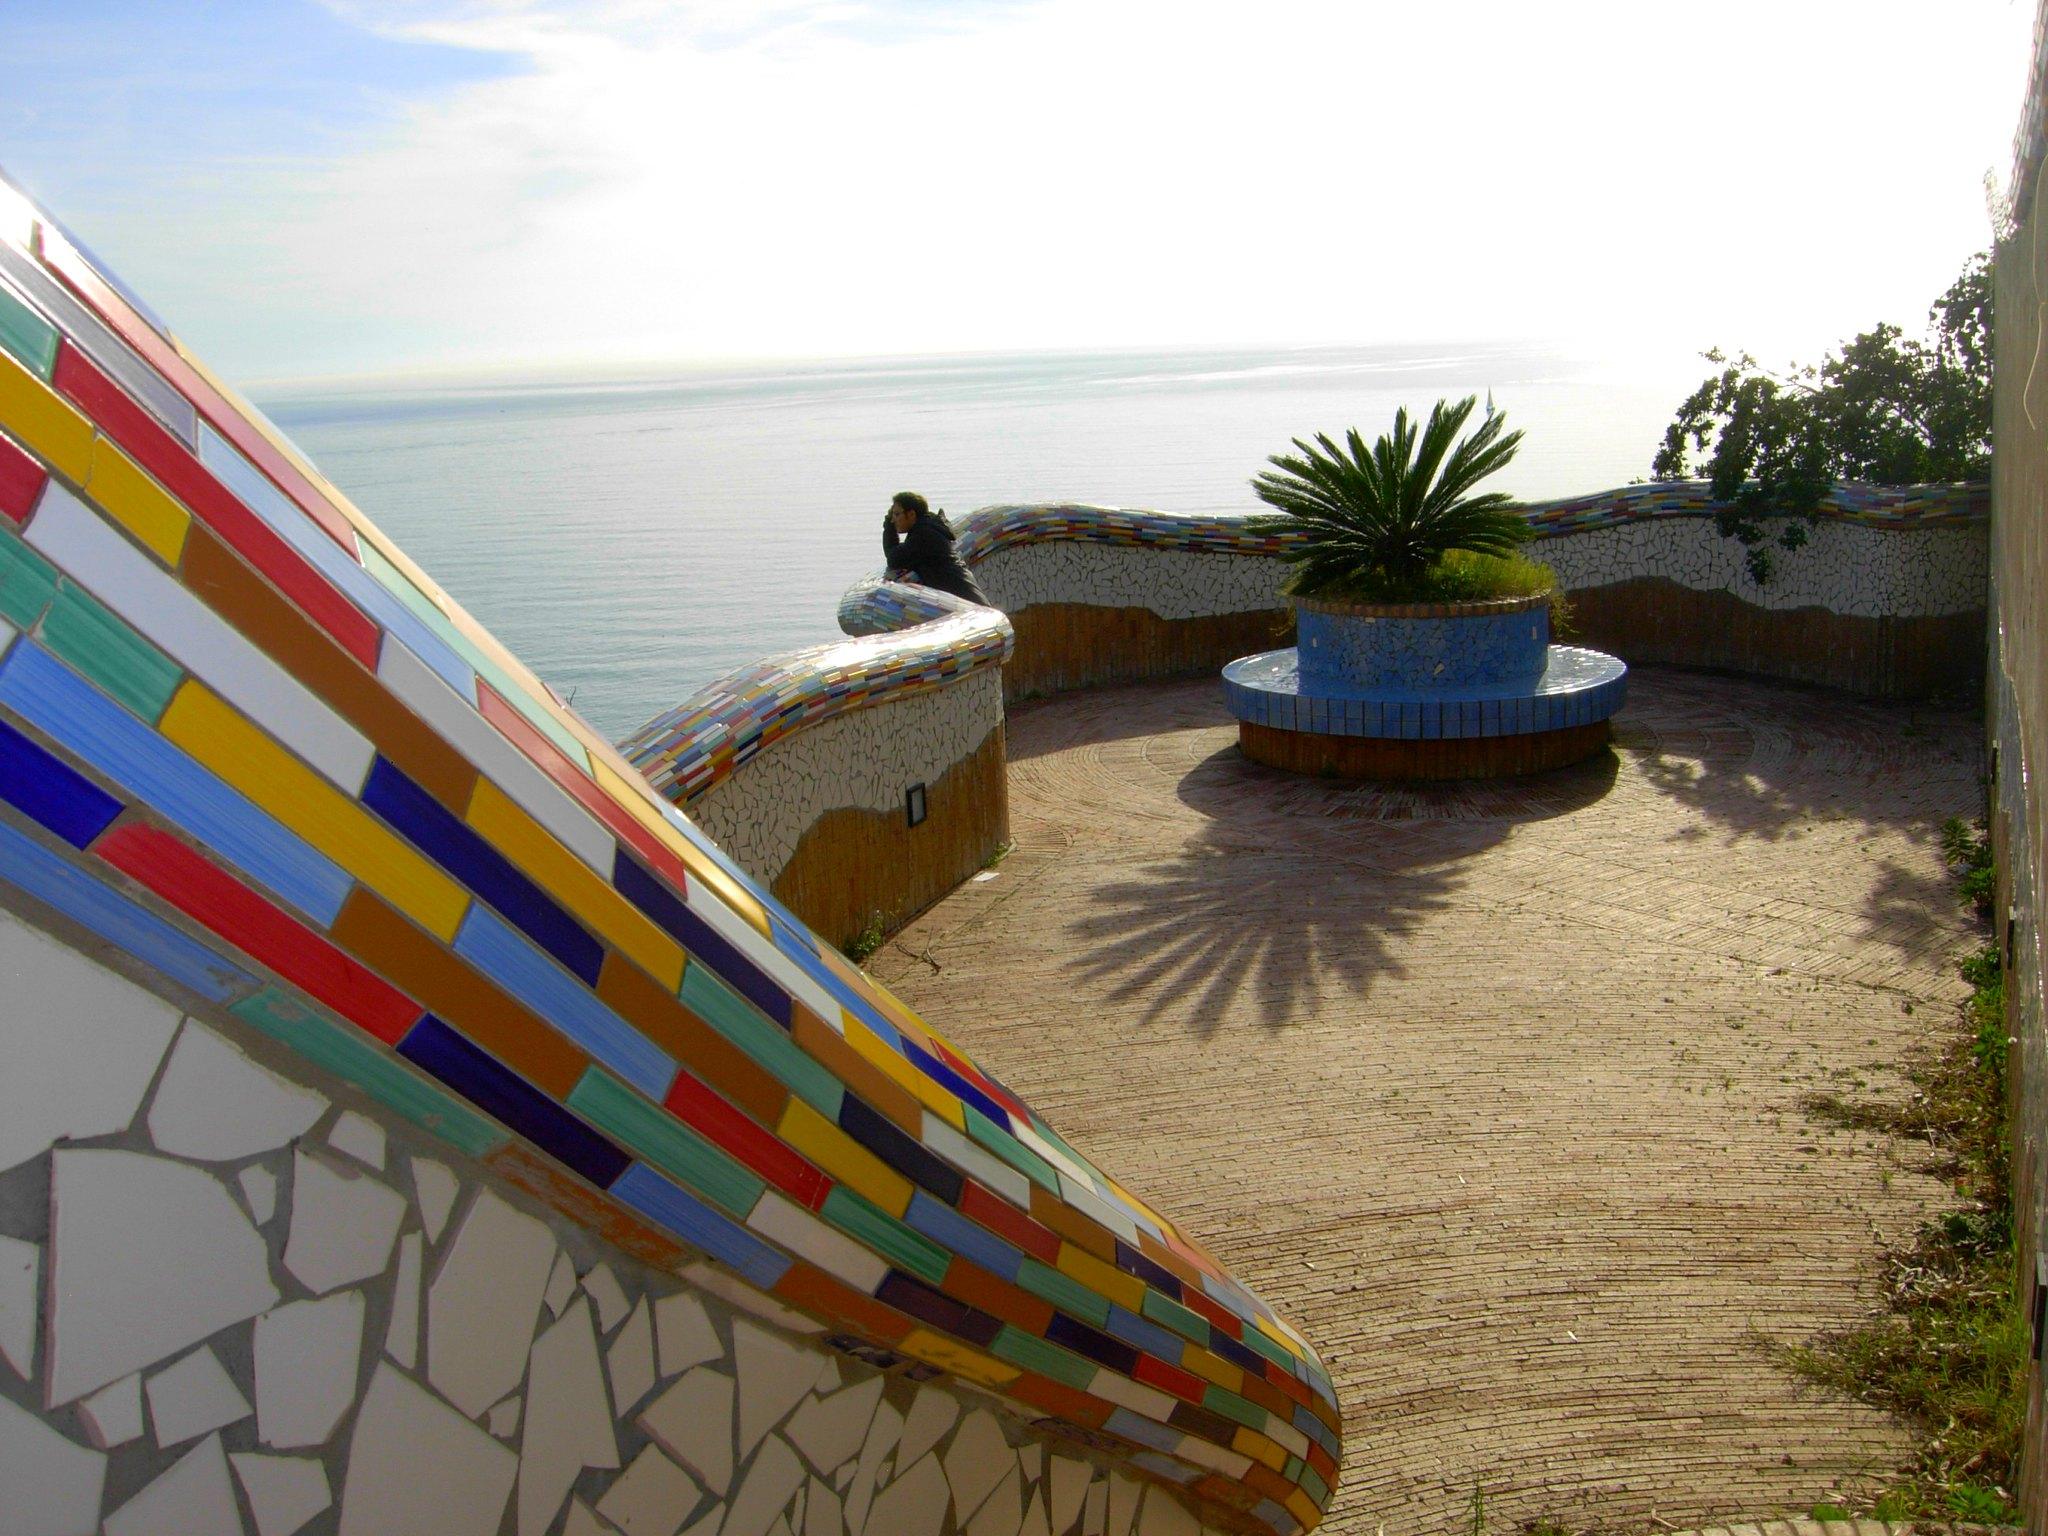 parc guell costiera amalfitana